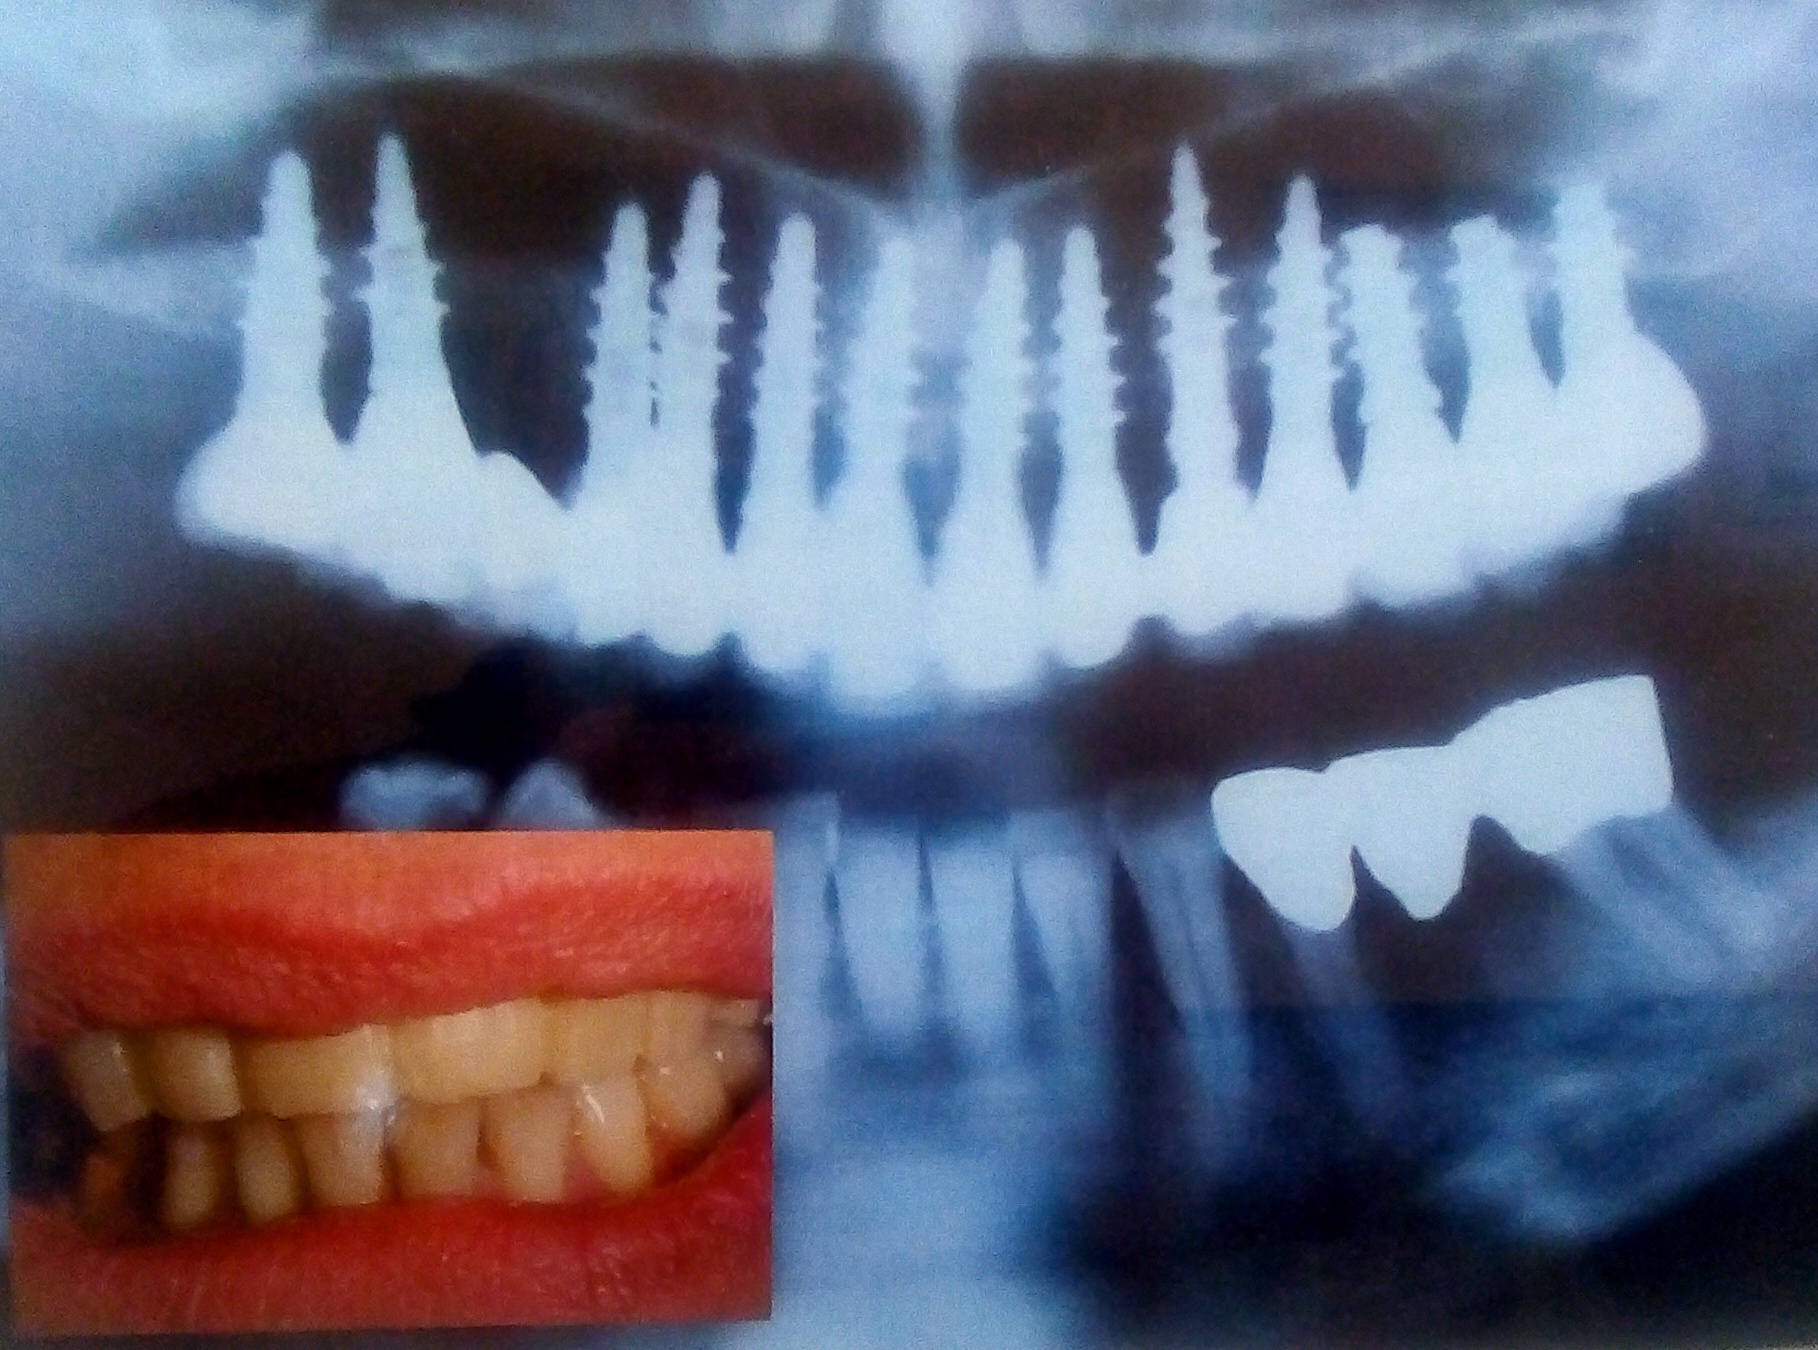 radiografia di protesi dentali